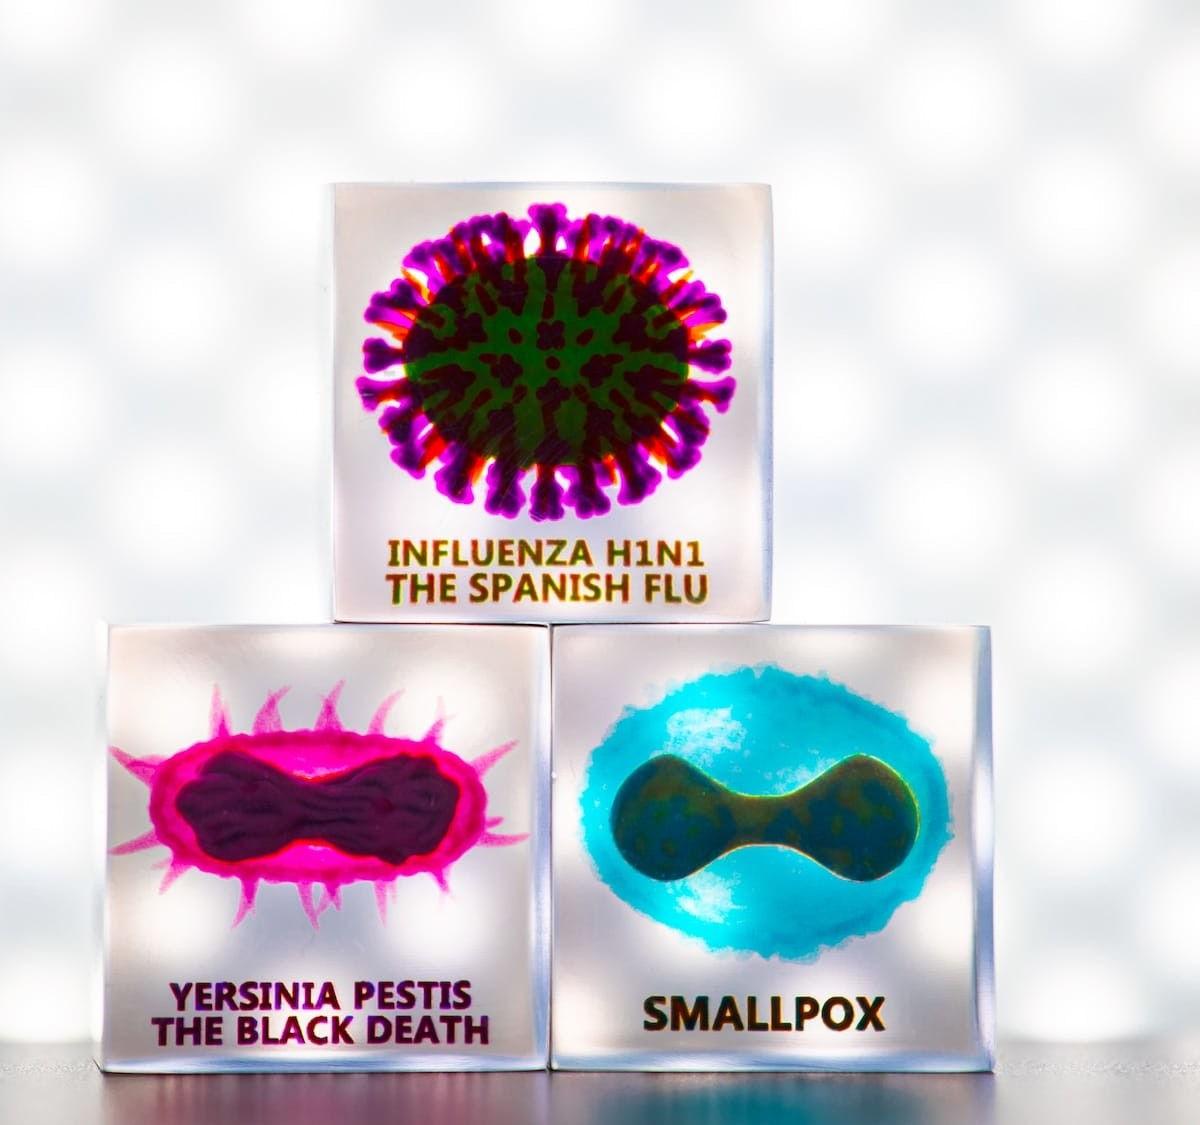 Contagion Cubes 3D virus & bacteria art displays different maladies